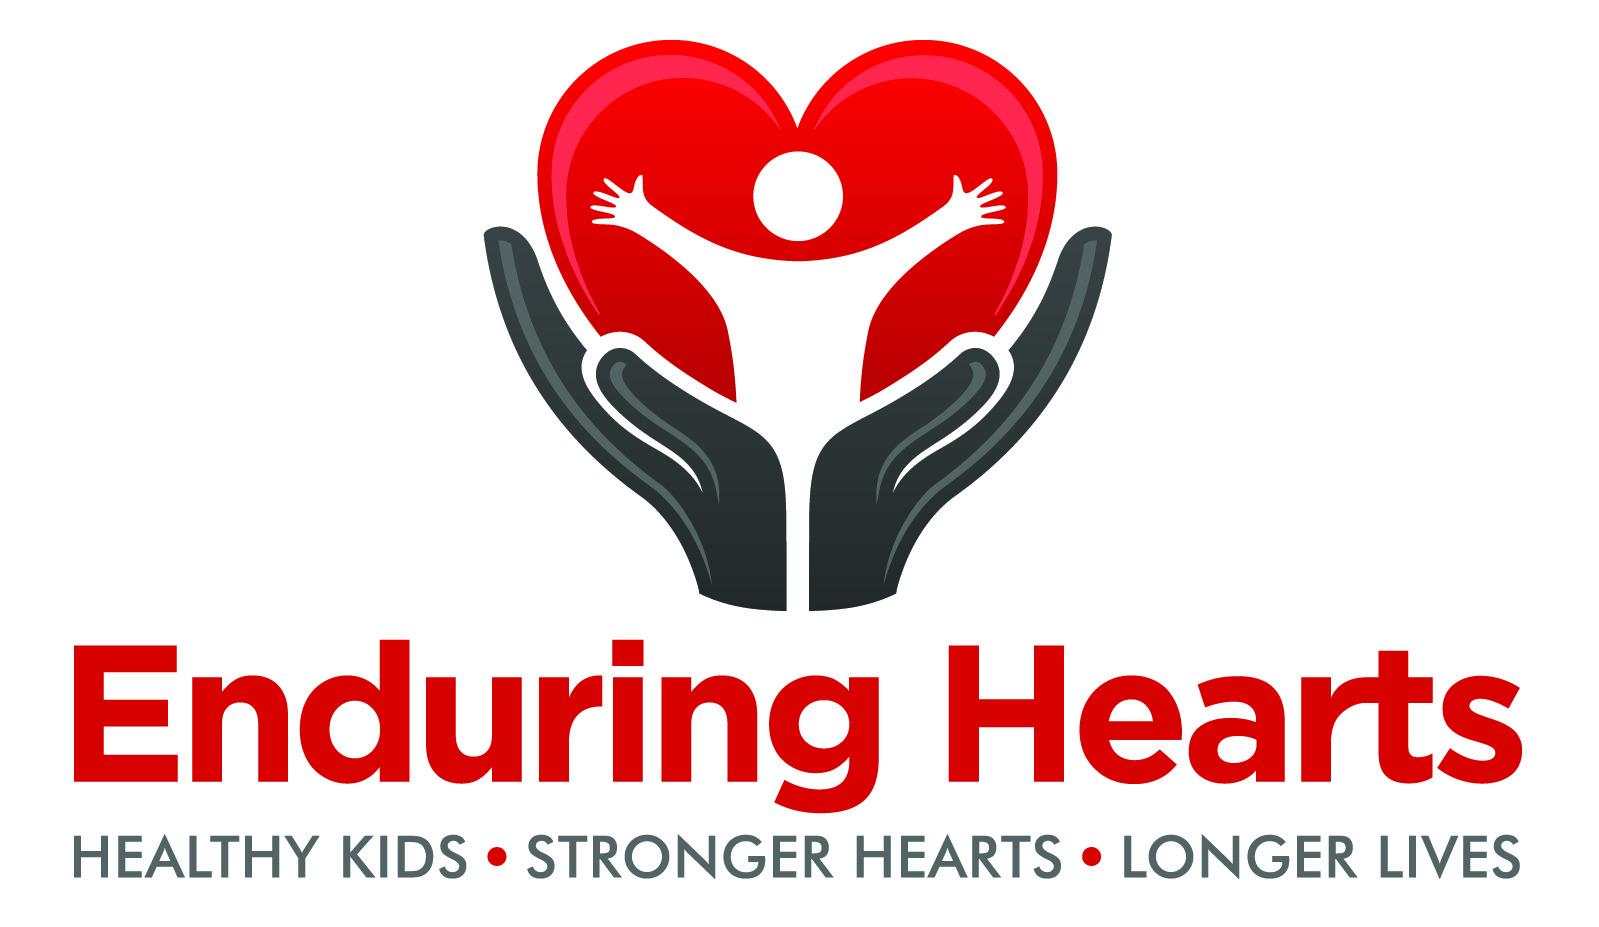 enduring_hearts-ADDEDMARGIN-large.jpg